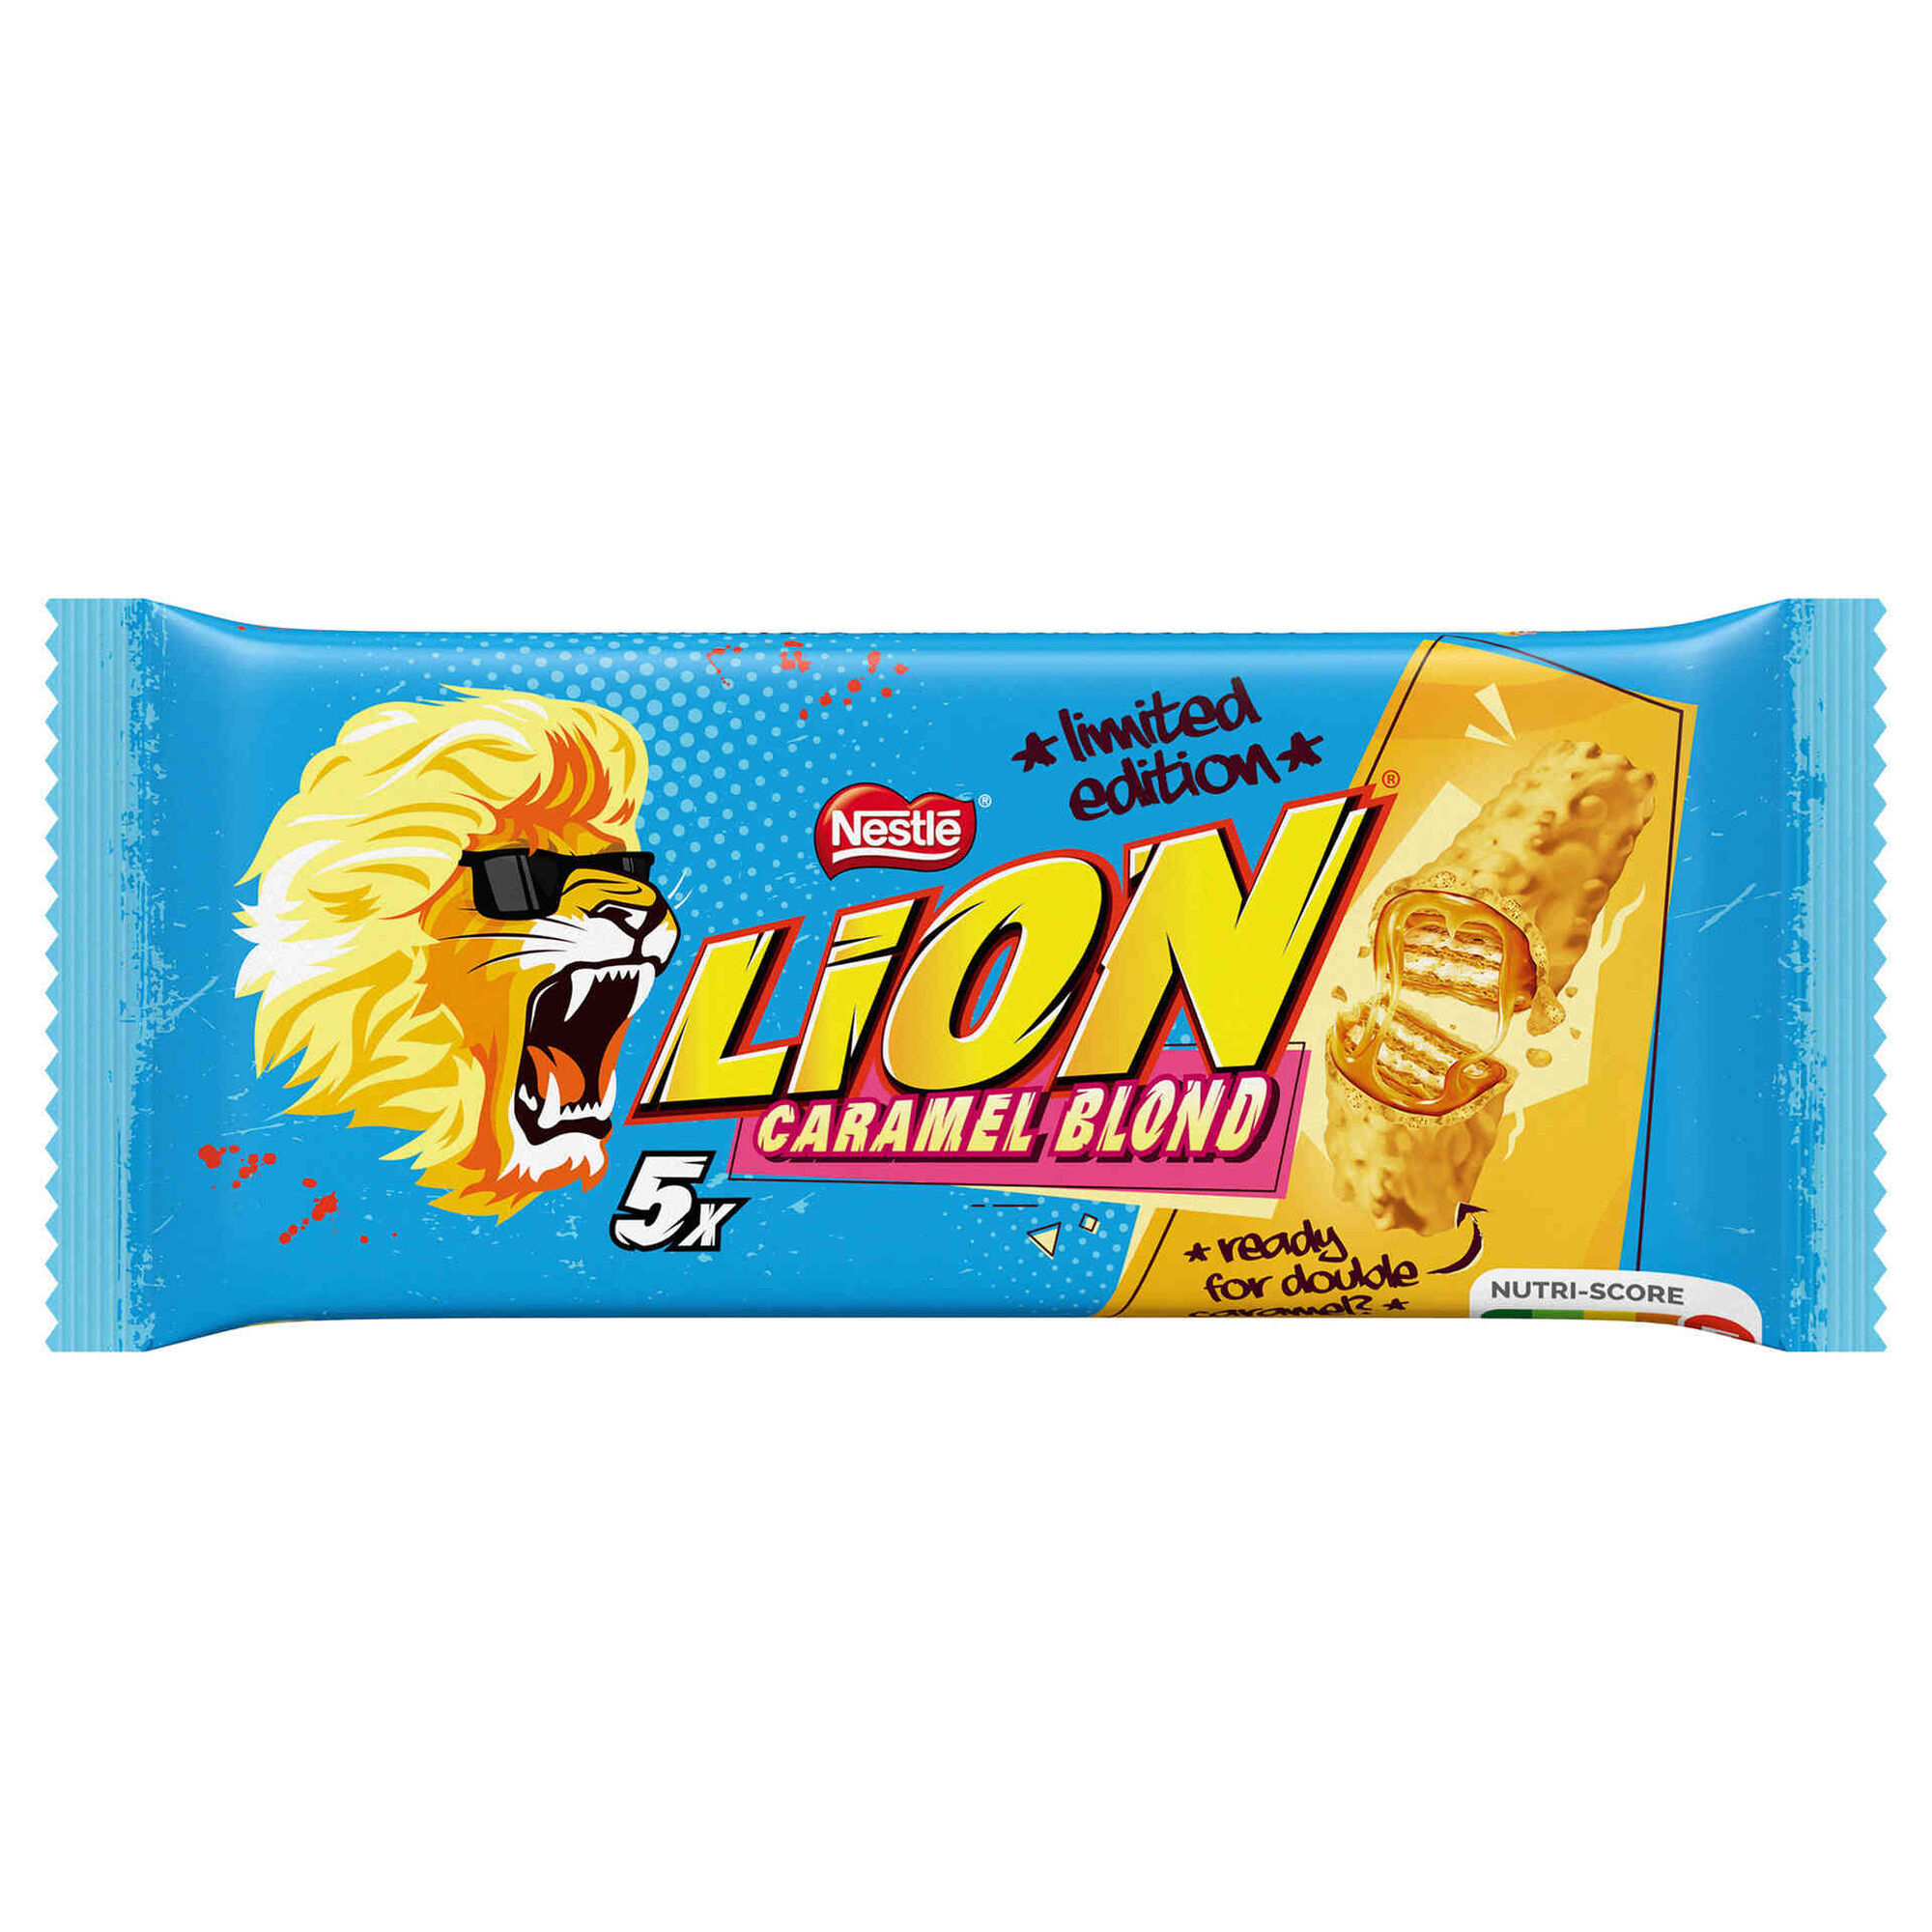 Snack de Chocolate de Leite Caramel Blond Lion